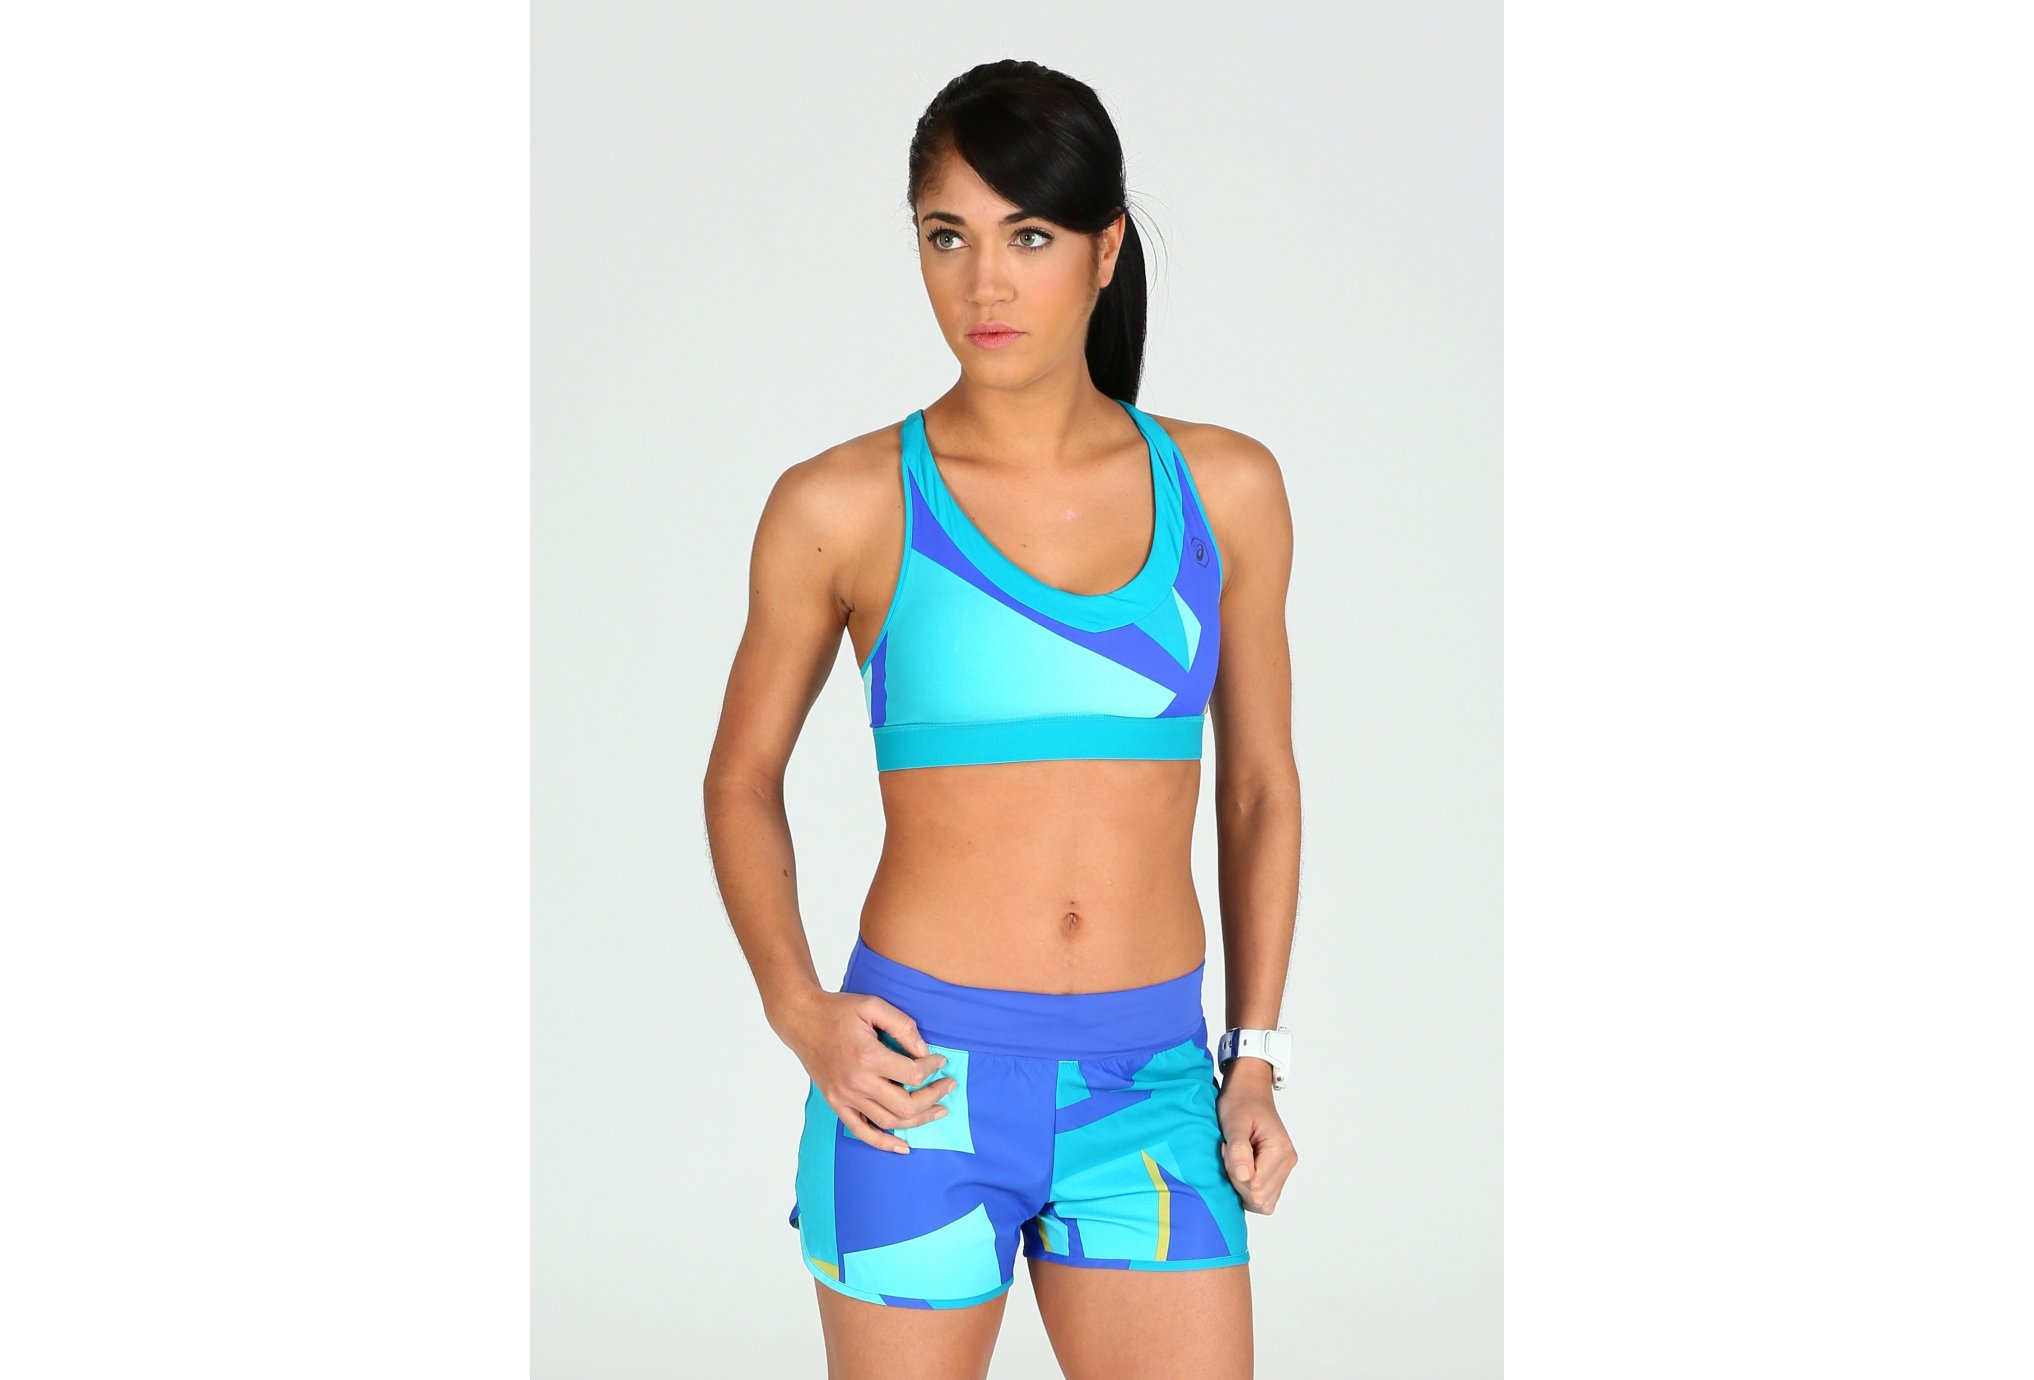 Asics FuzeX Bra vêtement running femme